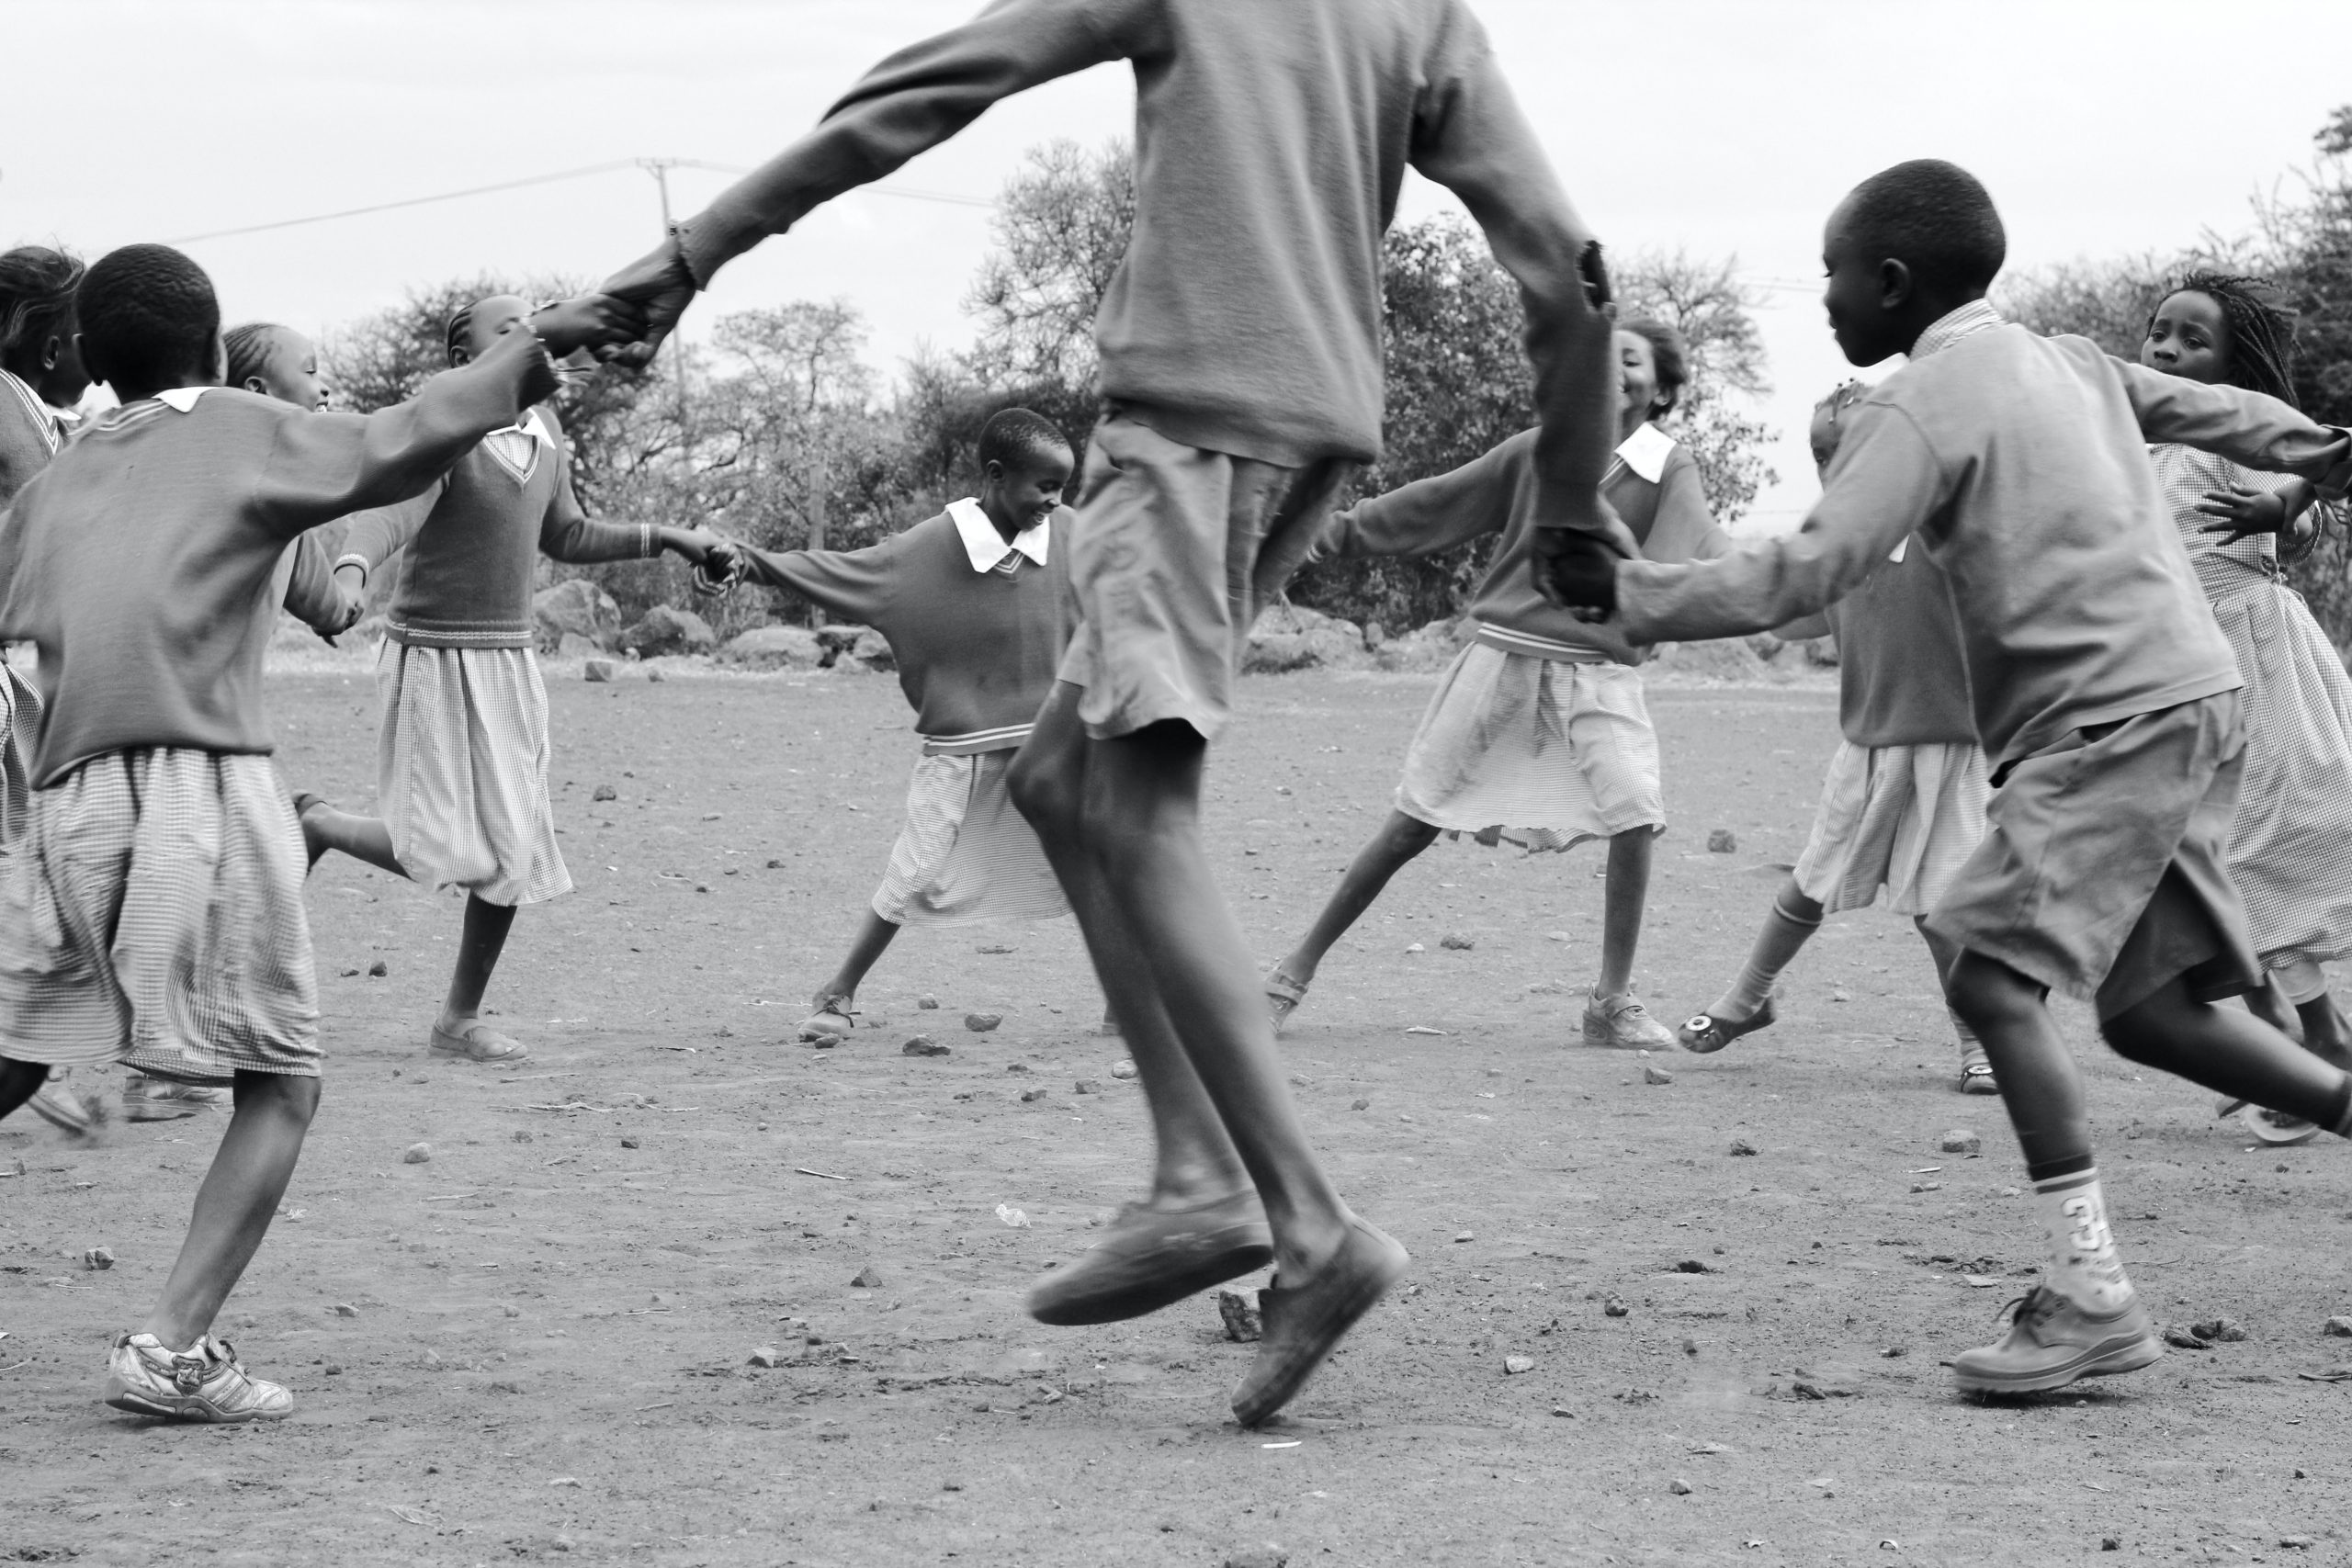 Volontariato internazionale in Kenya in una scuola secondaria